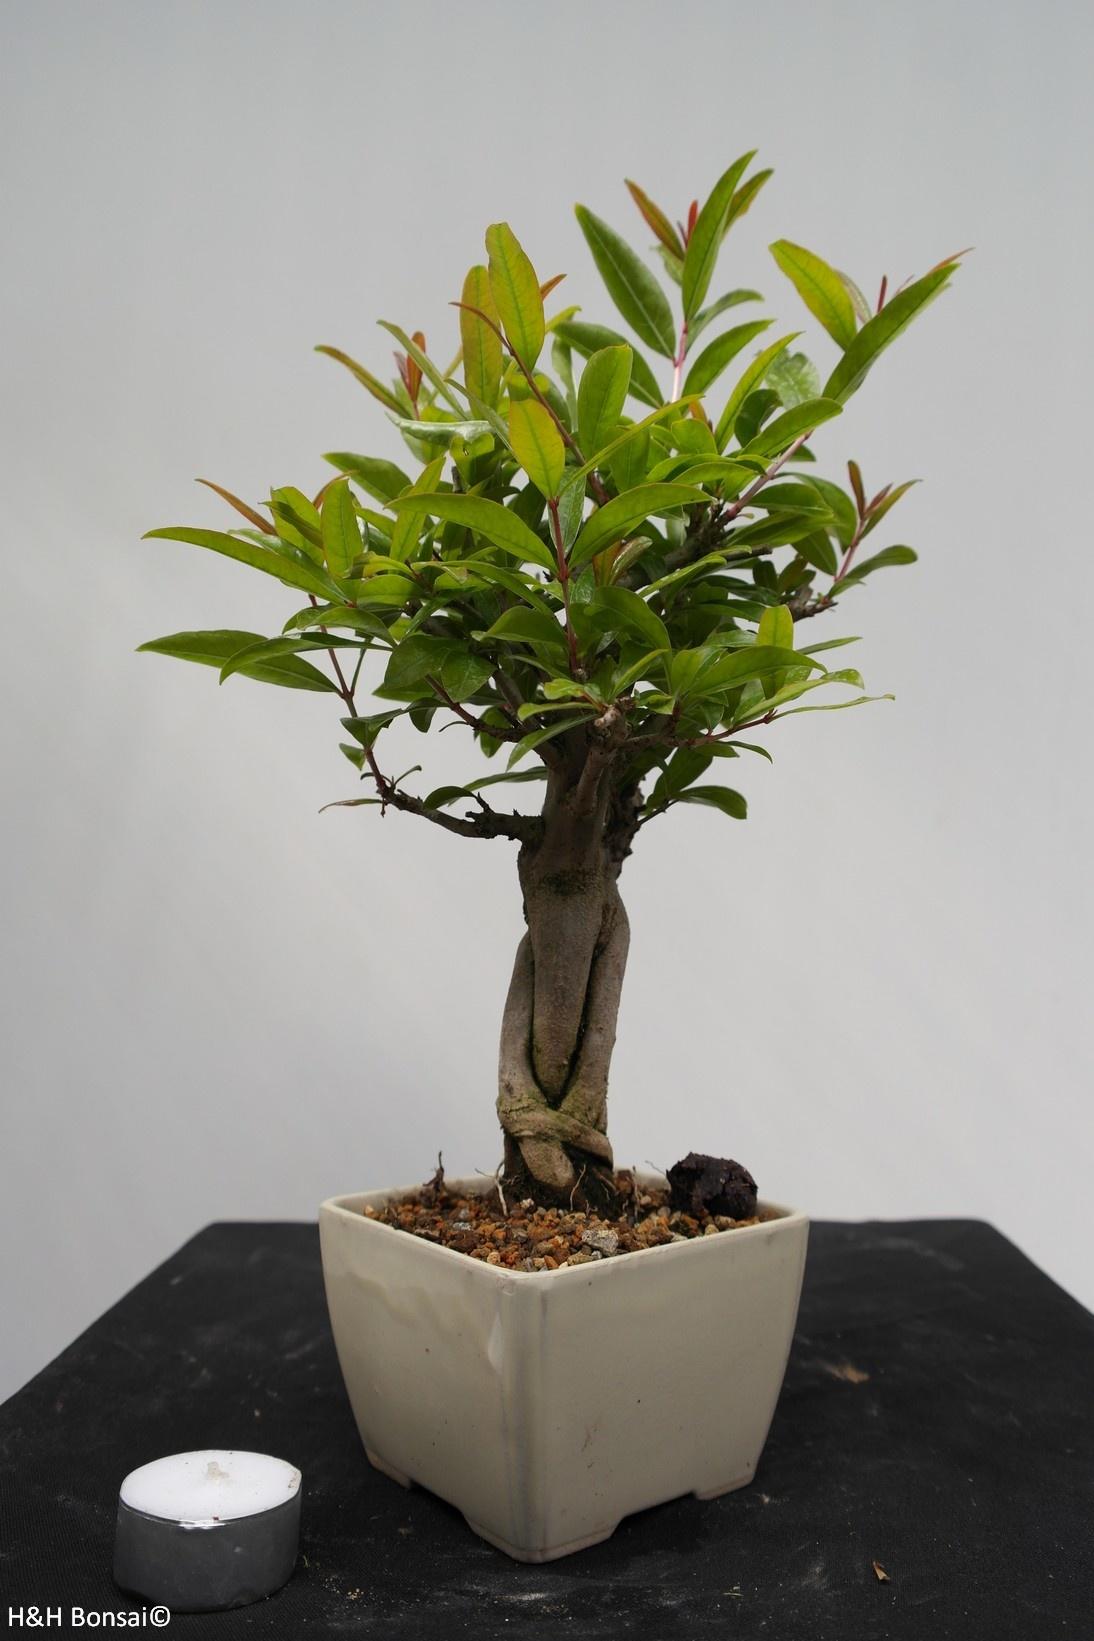 Bonsai Grenadier, Punica granatum, no. 7524